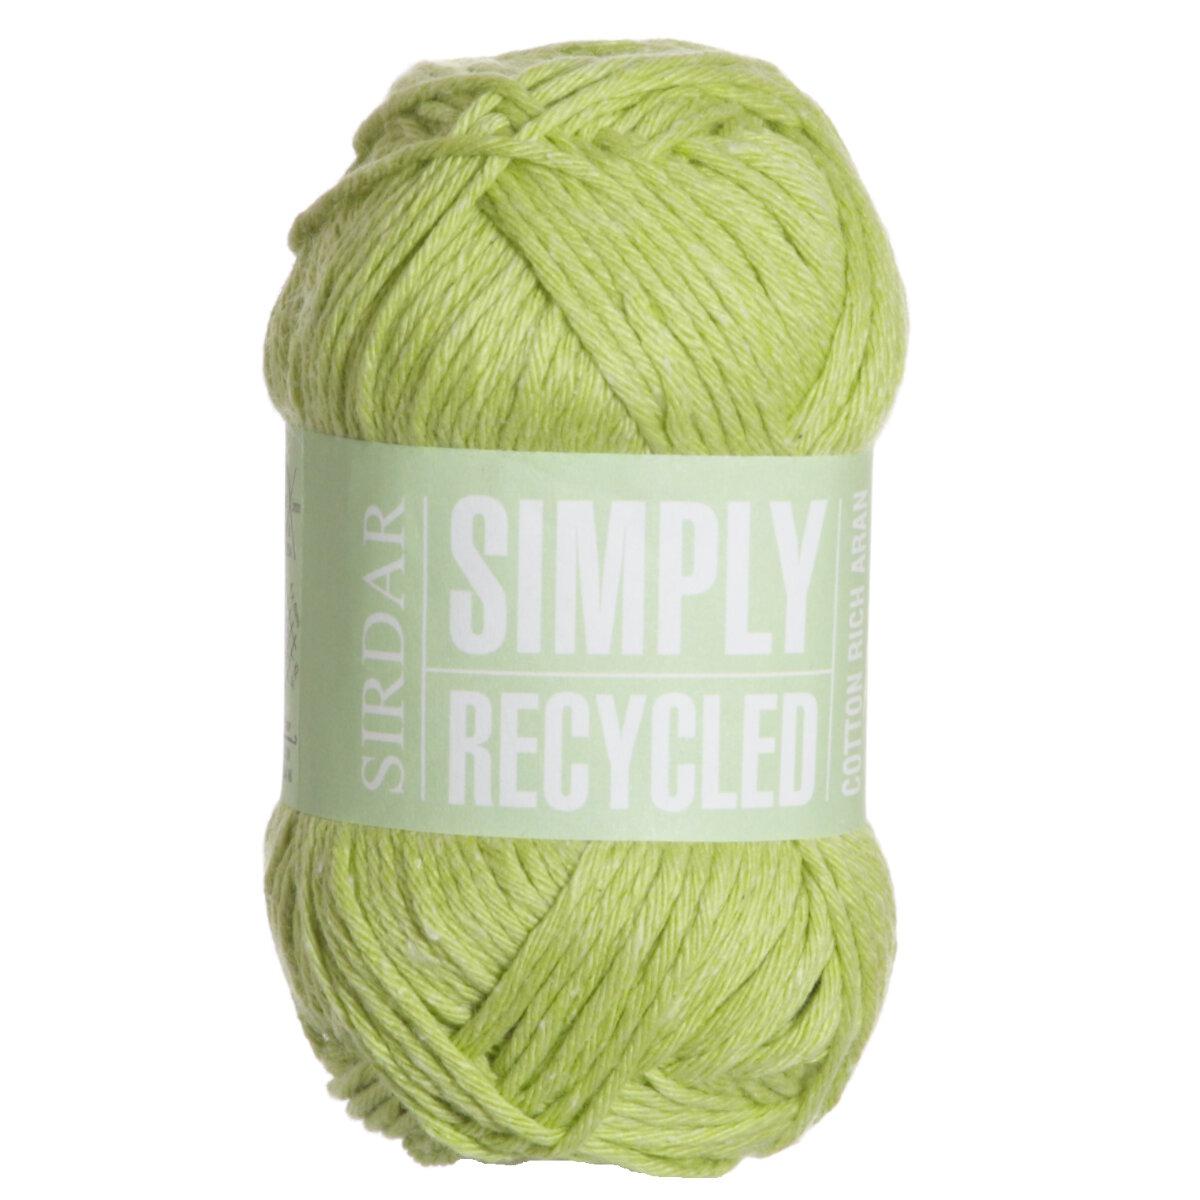 Aran Yarn : Sirdar Simply Recycled Aran Yarn - 39 Lime at Jimmy Beans Wool